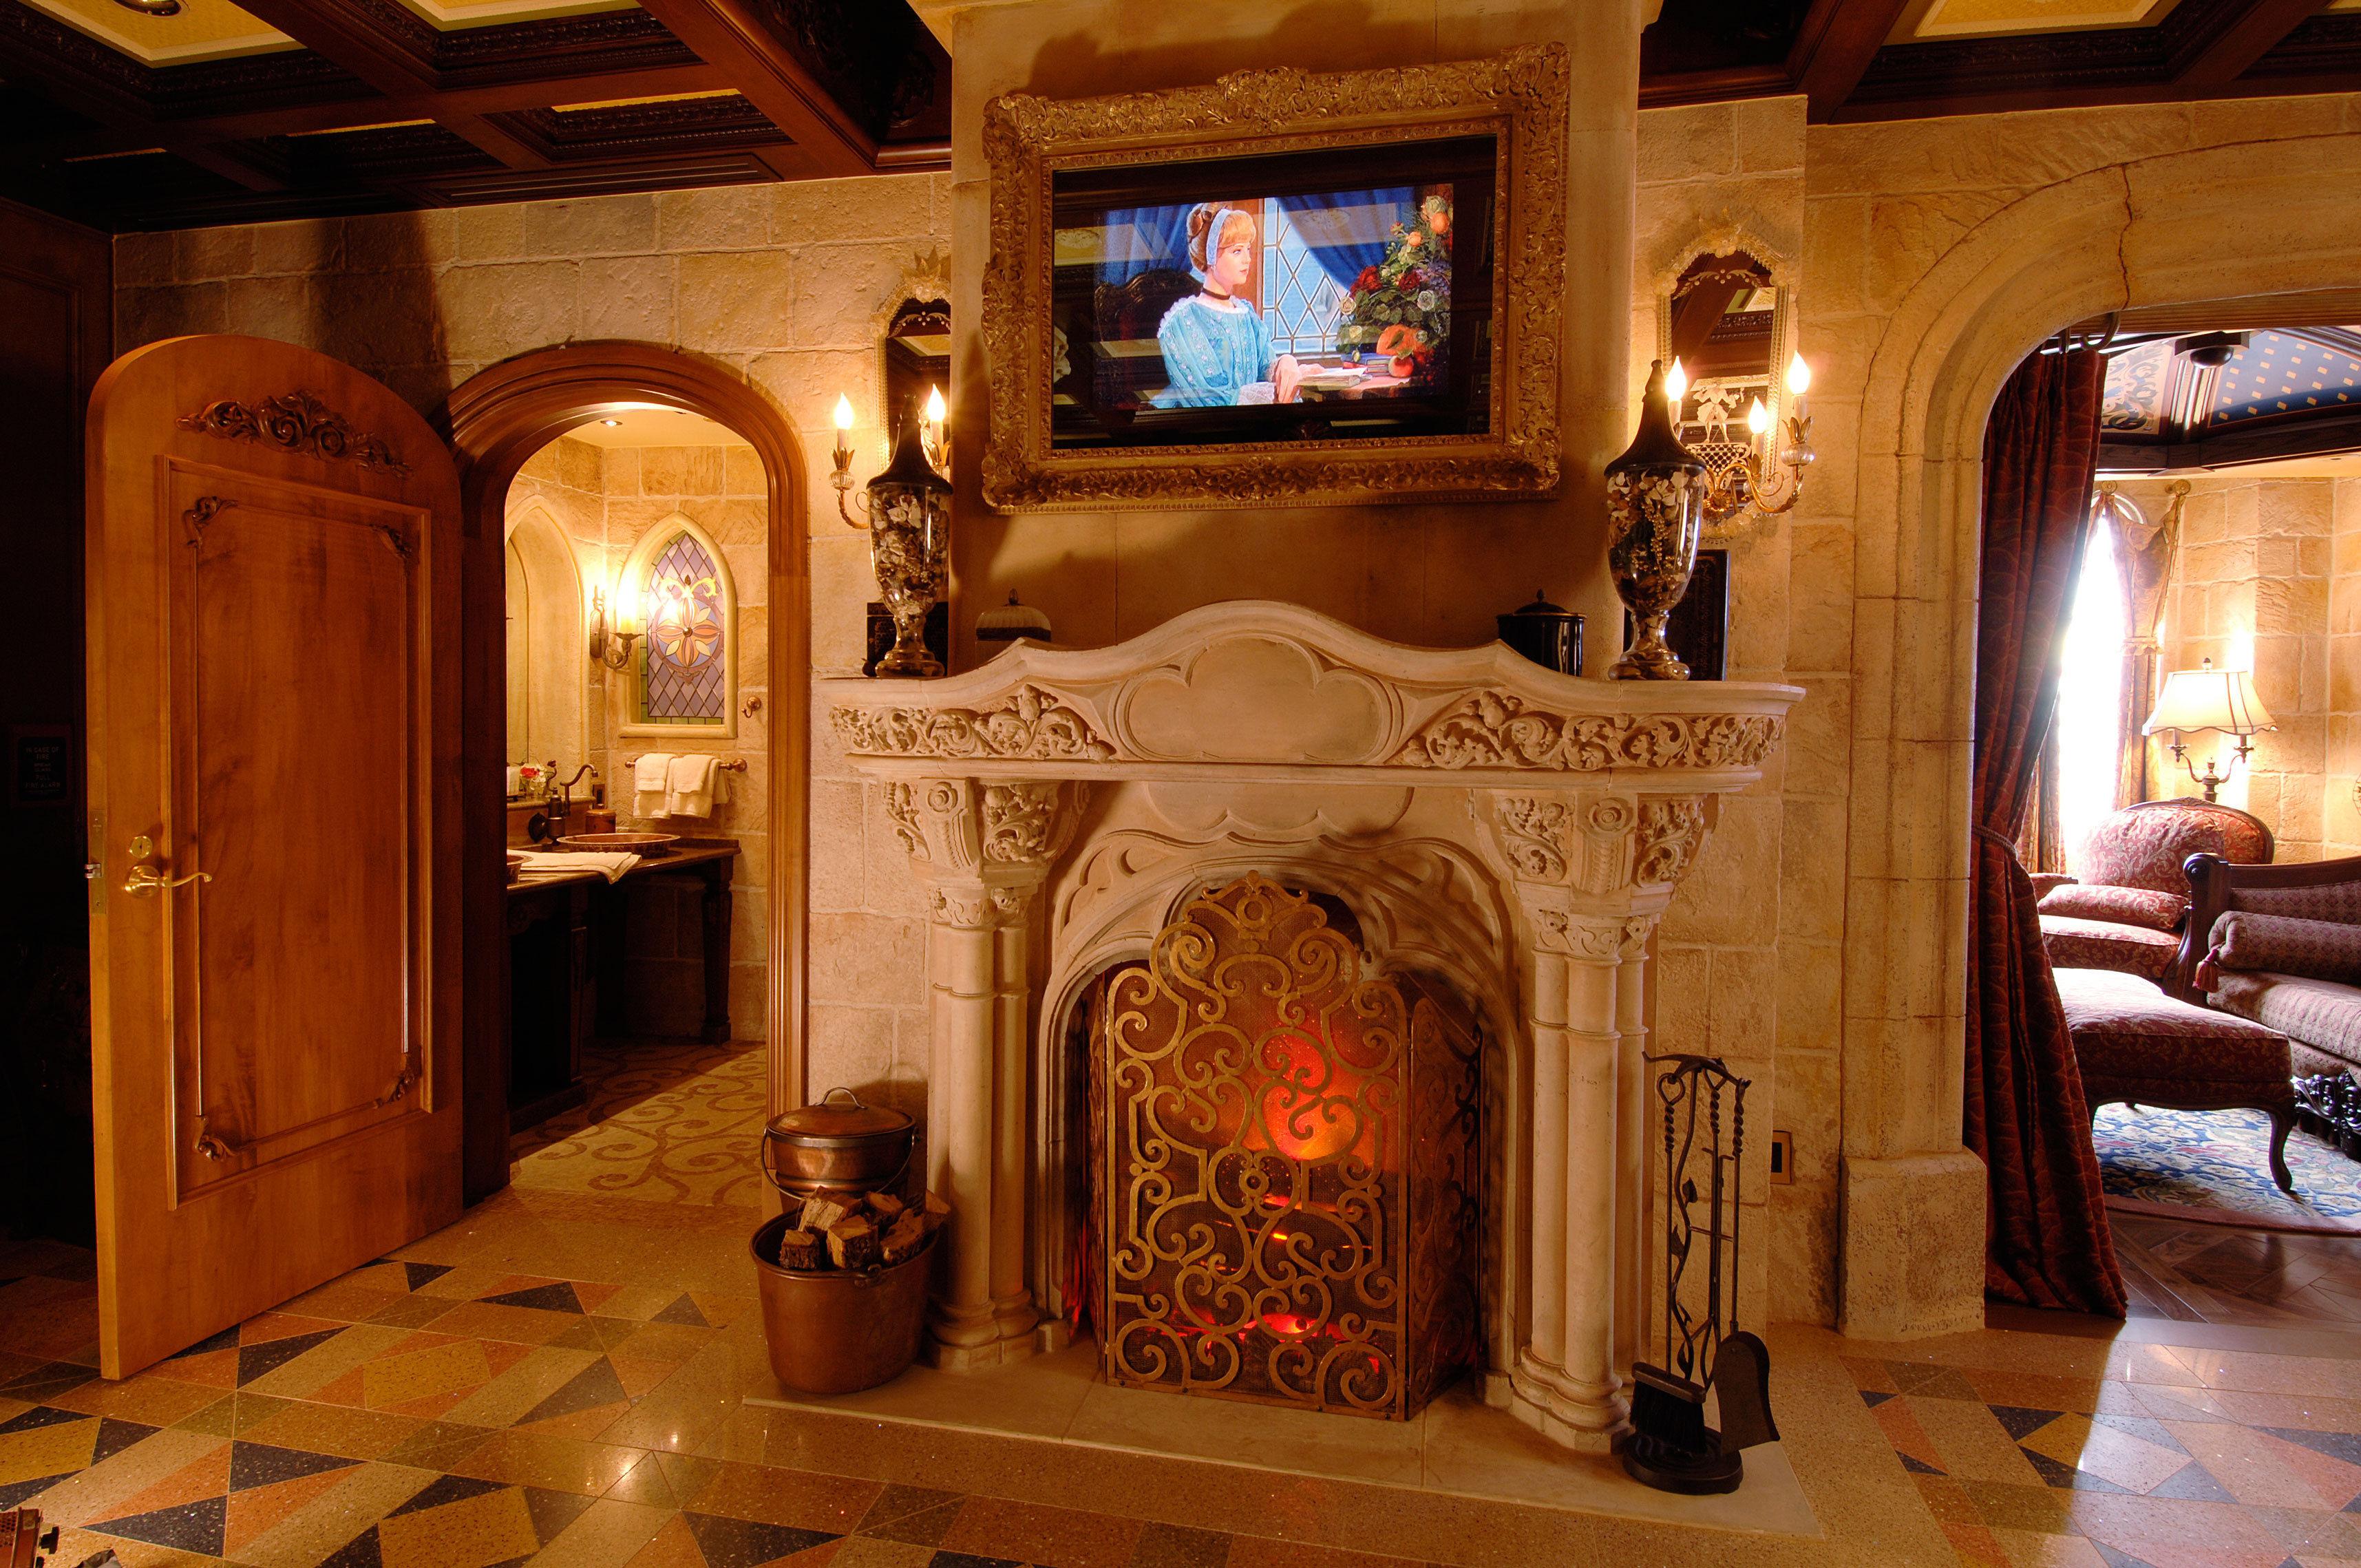 04-tour-suite-secreta-cinderela-castelo-magic-kingdom-florida-disney